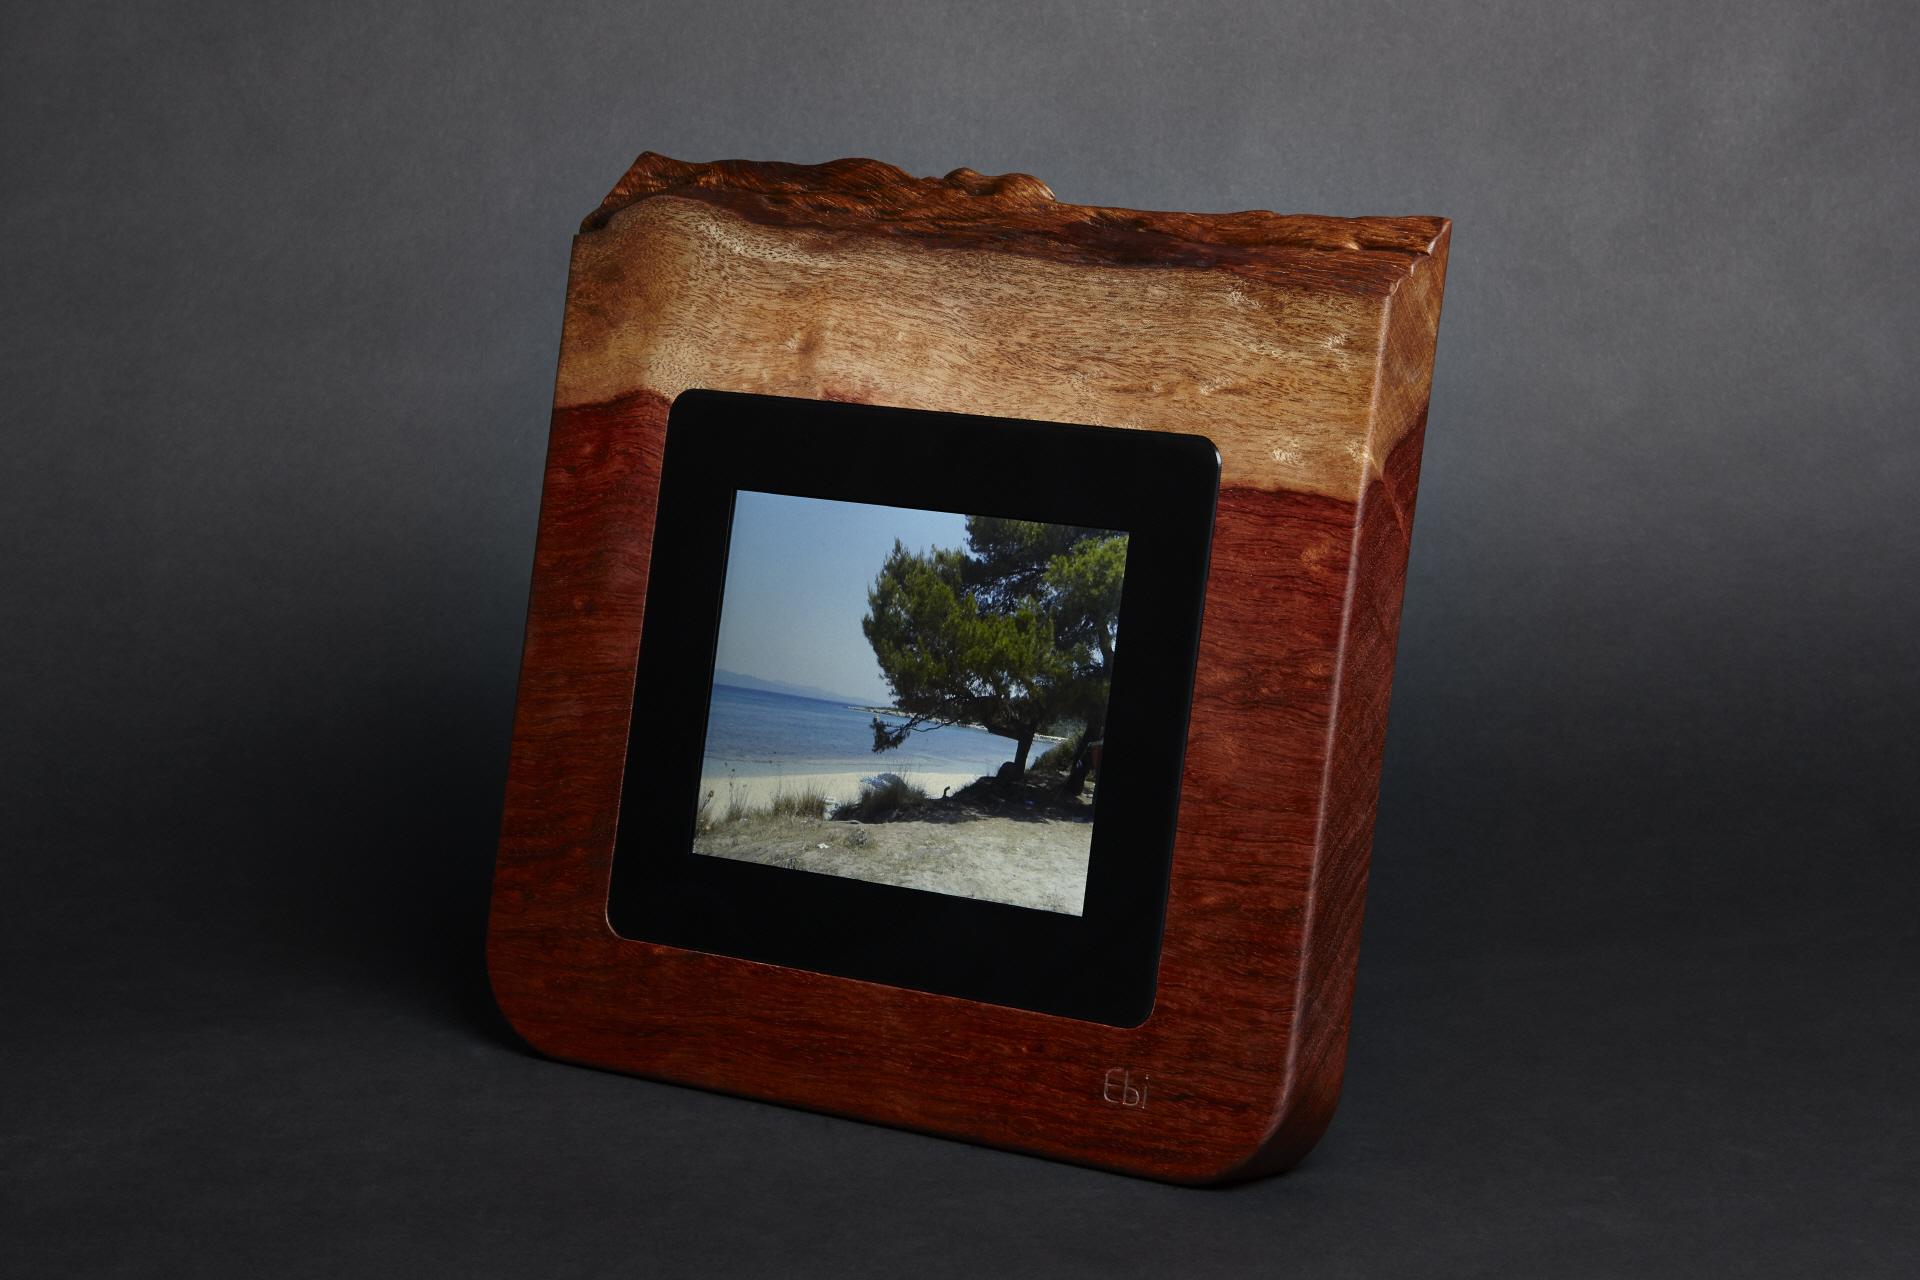 ebidesign ihr digitaler bilderrahmen in holz. Black Bedroom Furniture Sets. Home Design Ideas